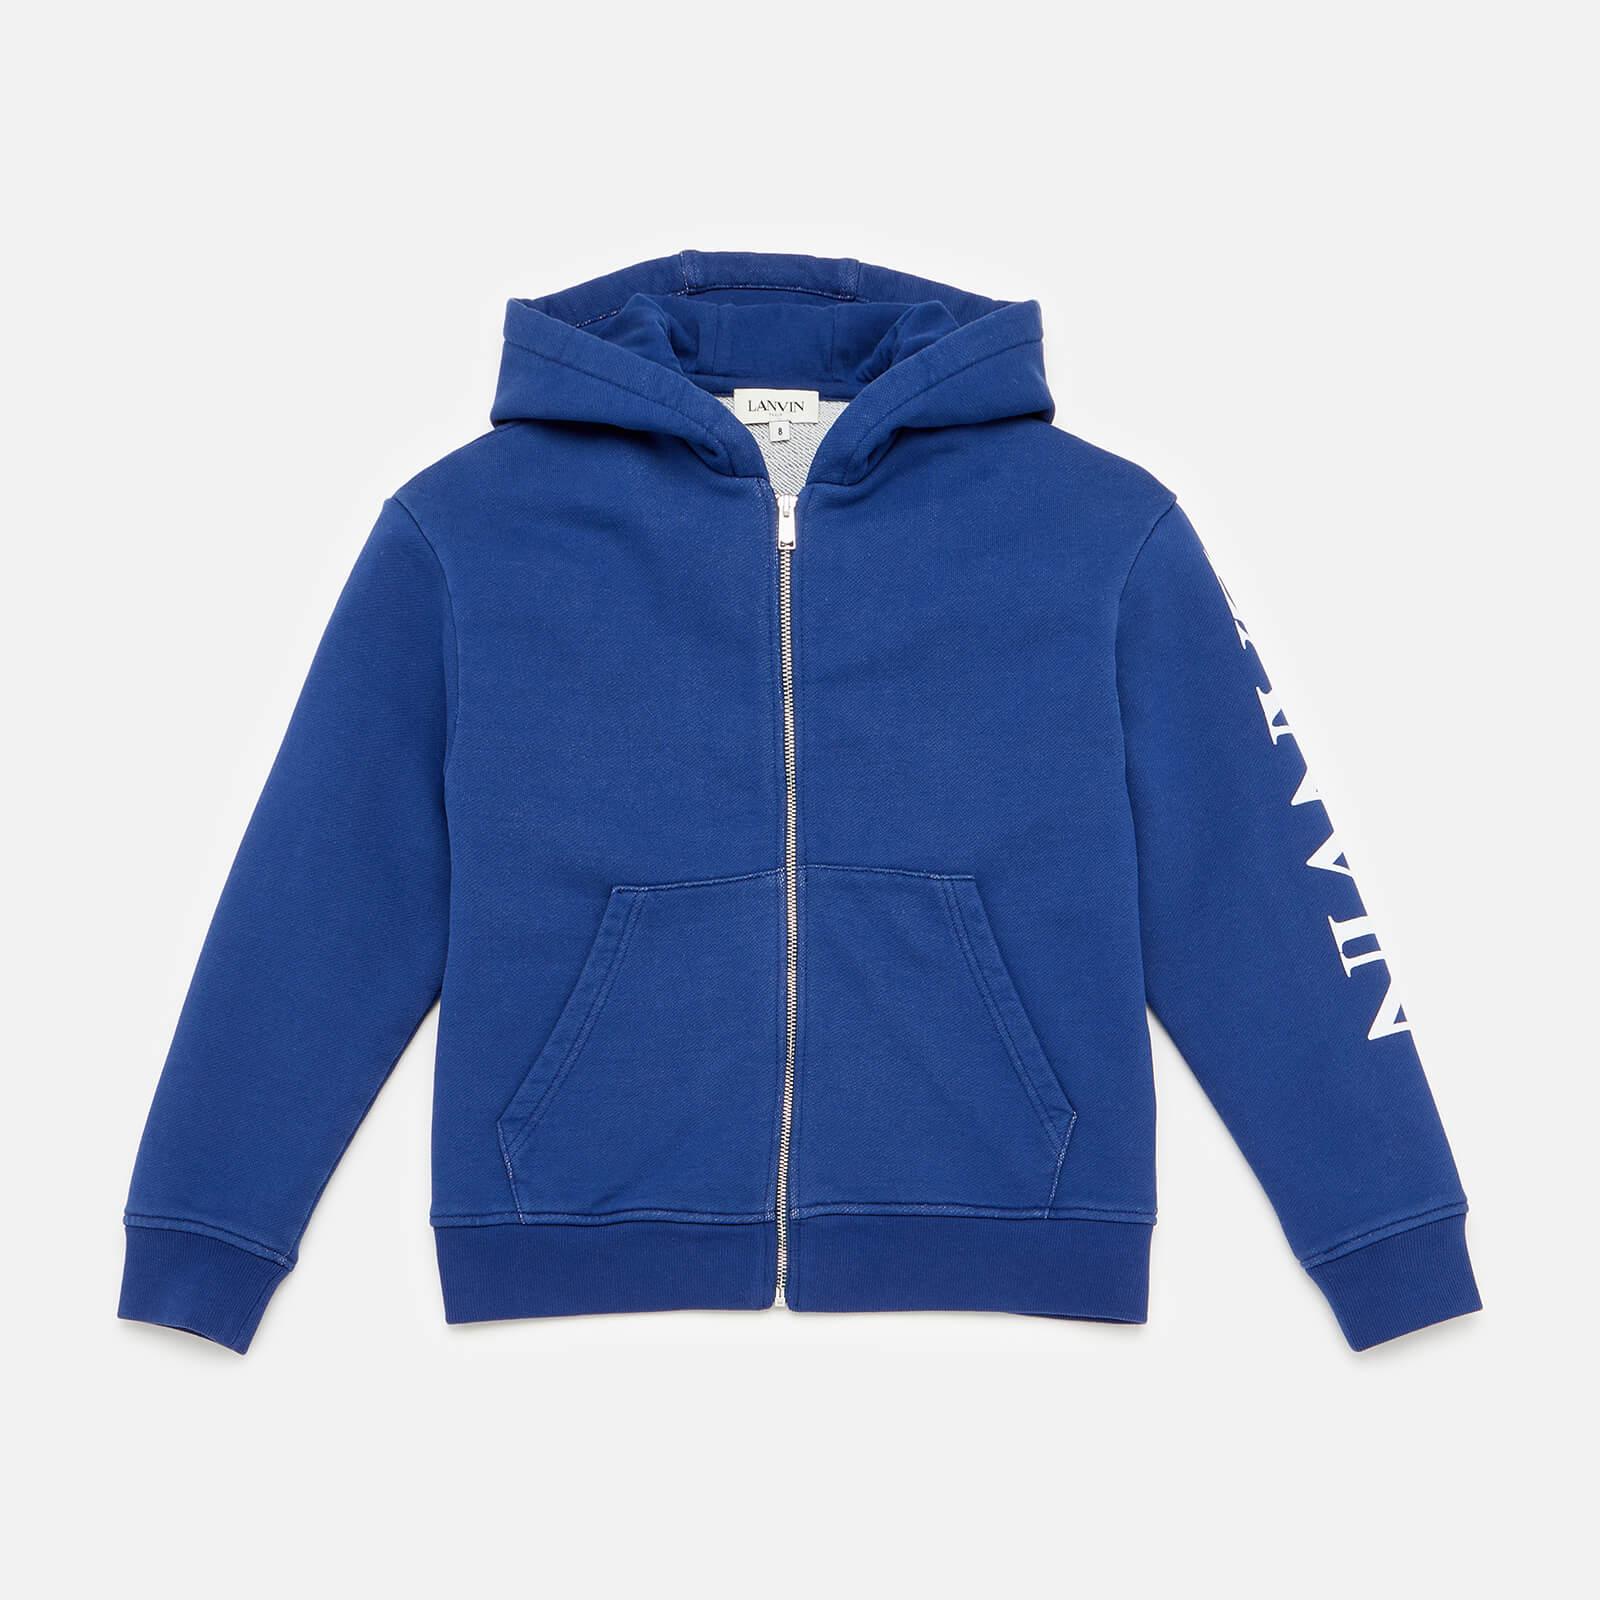 Lanvin Boys' Hooded Zip Cardigan - Denim Blue - 4 Years